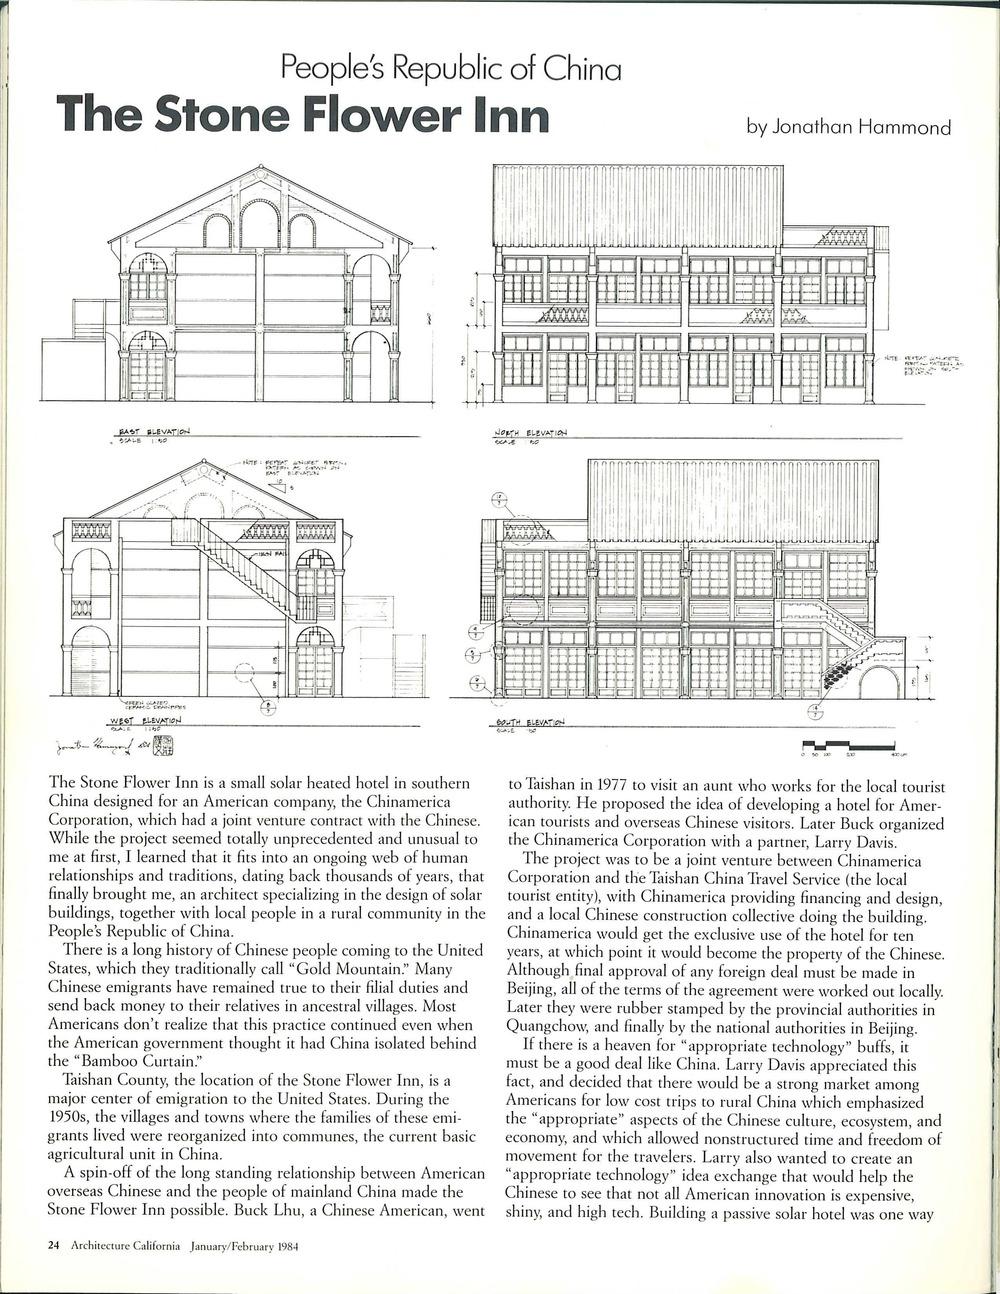 architecture california_1984_Page_4.jpg